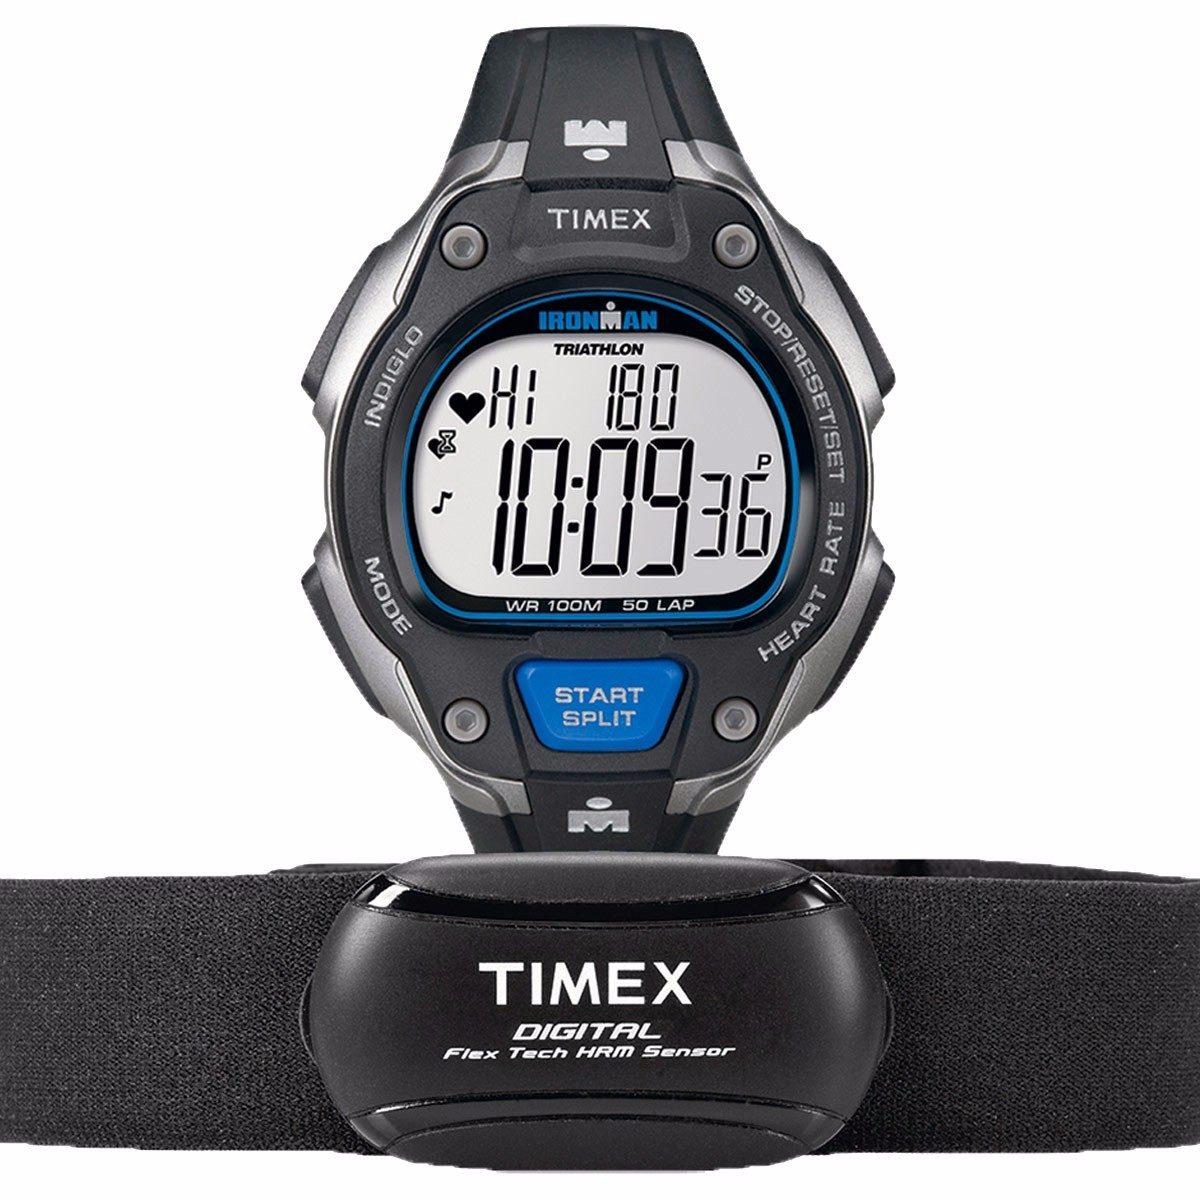 5f368f3f4ca0 reloj timex ironman road trainer heart rate t5k718 hombre. Cargando zoom.